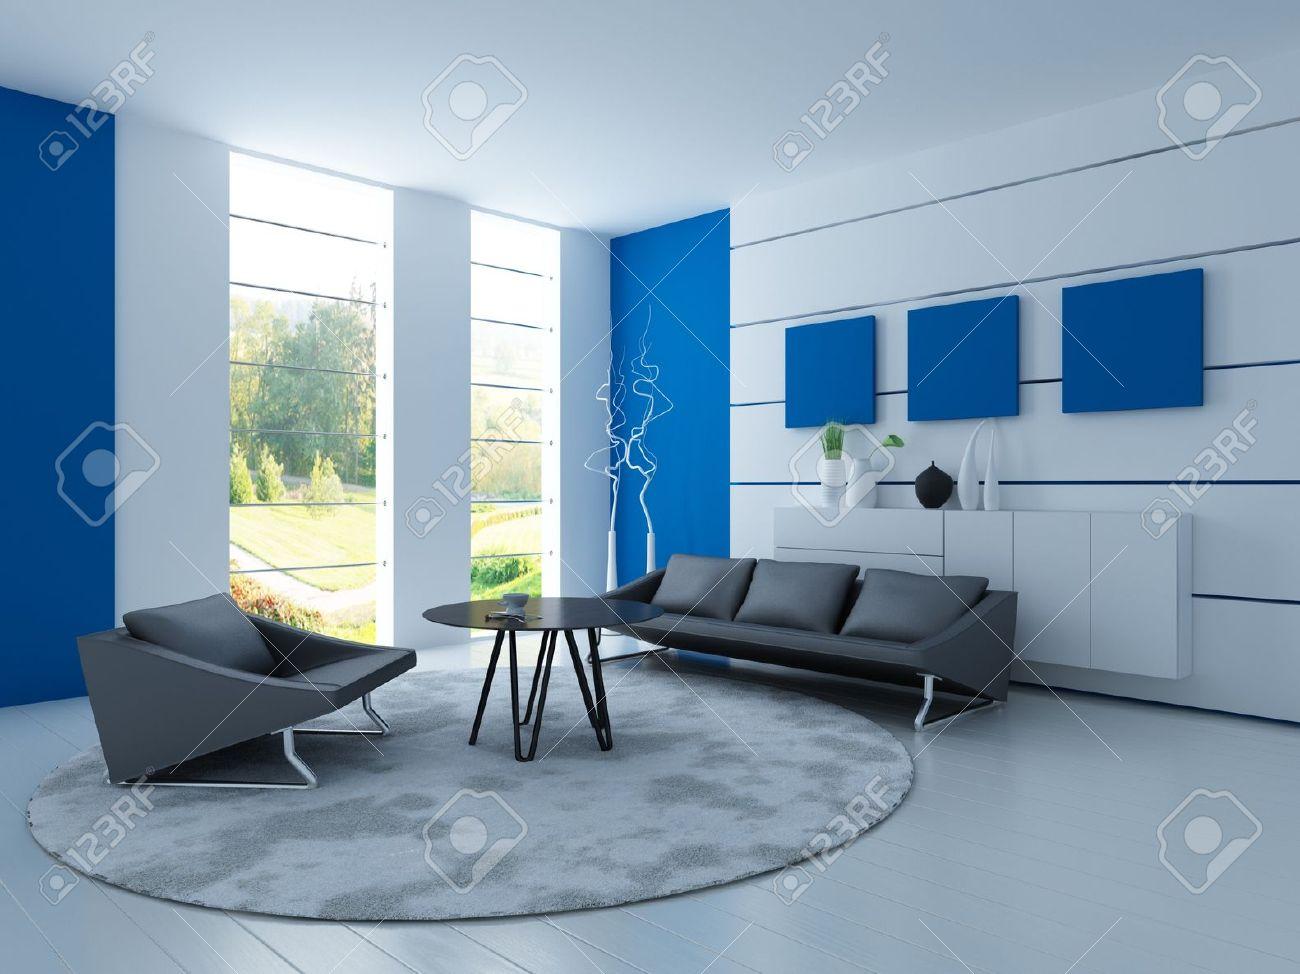 Light blue living room with black sofa Stock Photo - 19532918